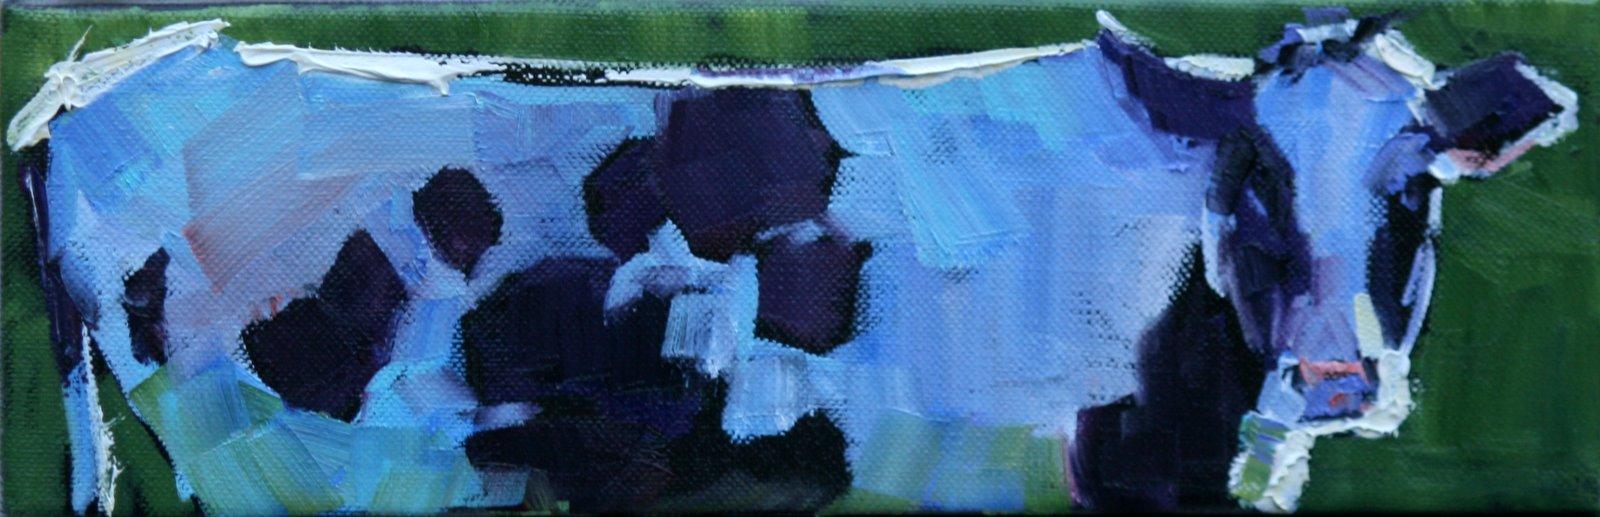 """spot"" original fine art by Carol Carmichael"